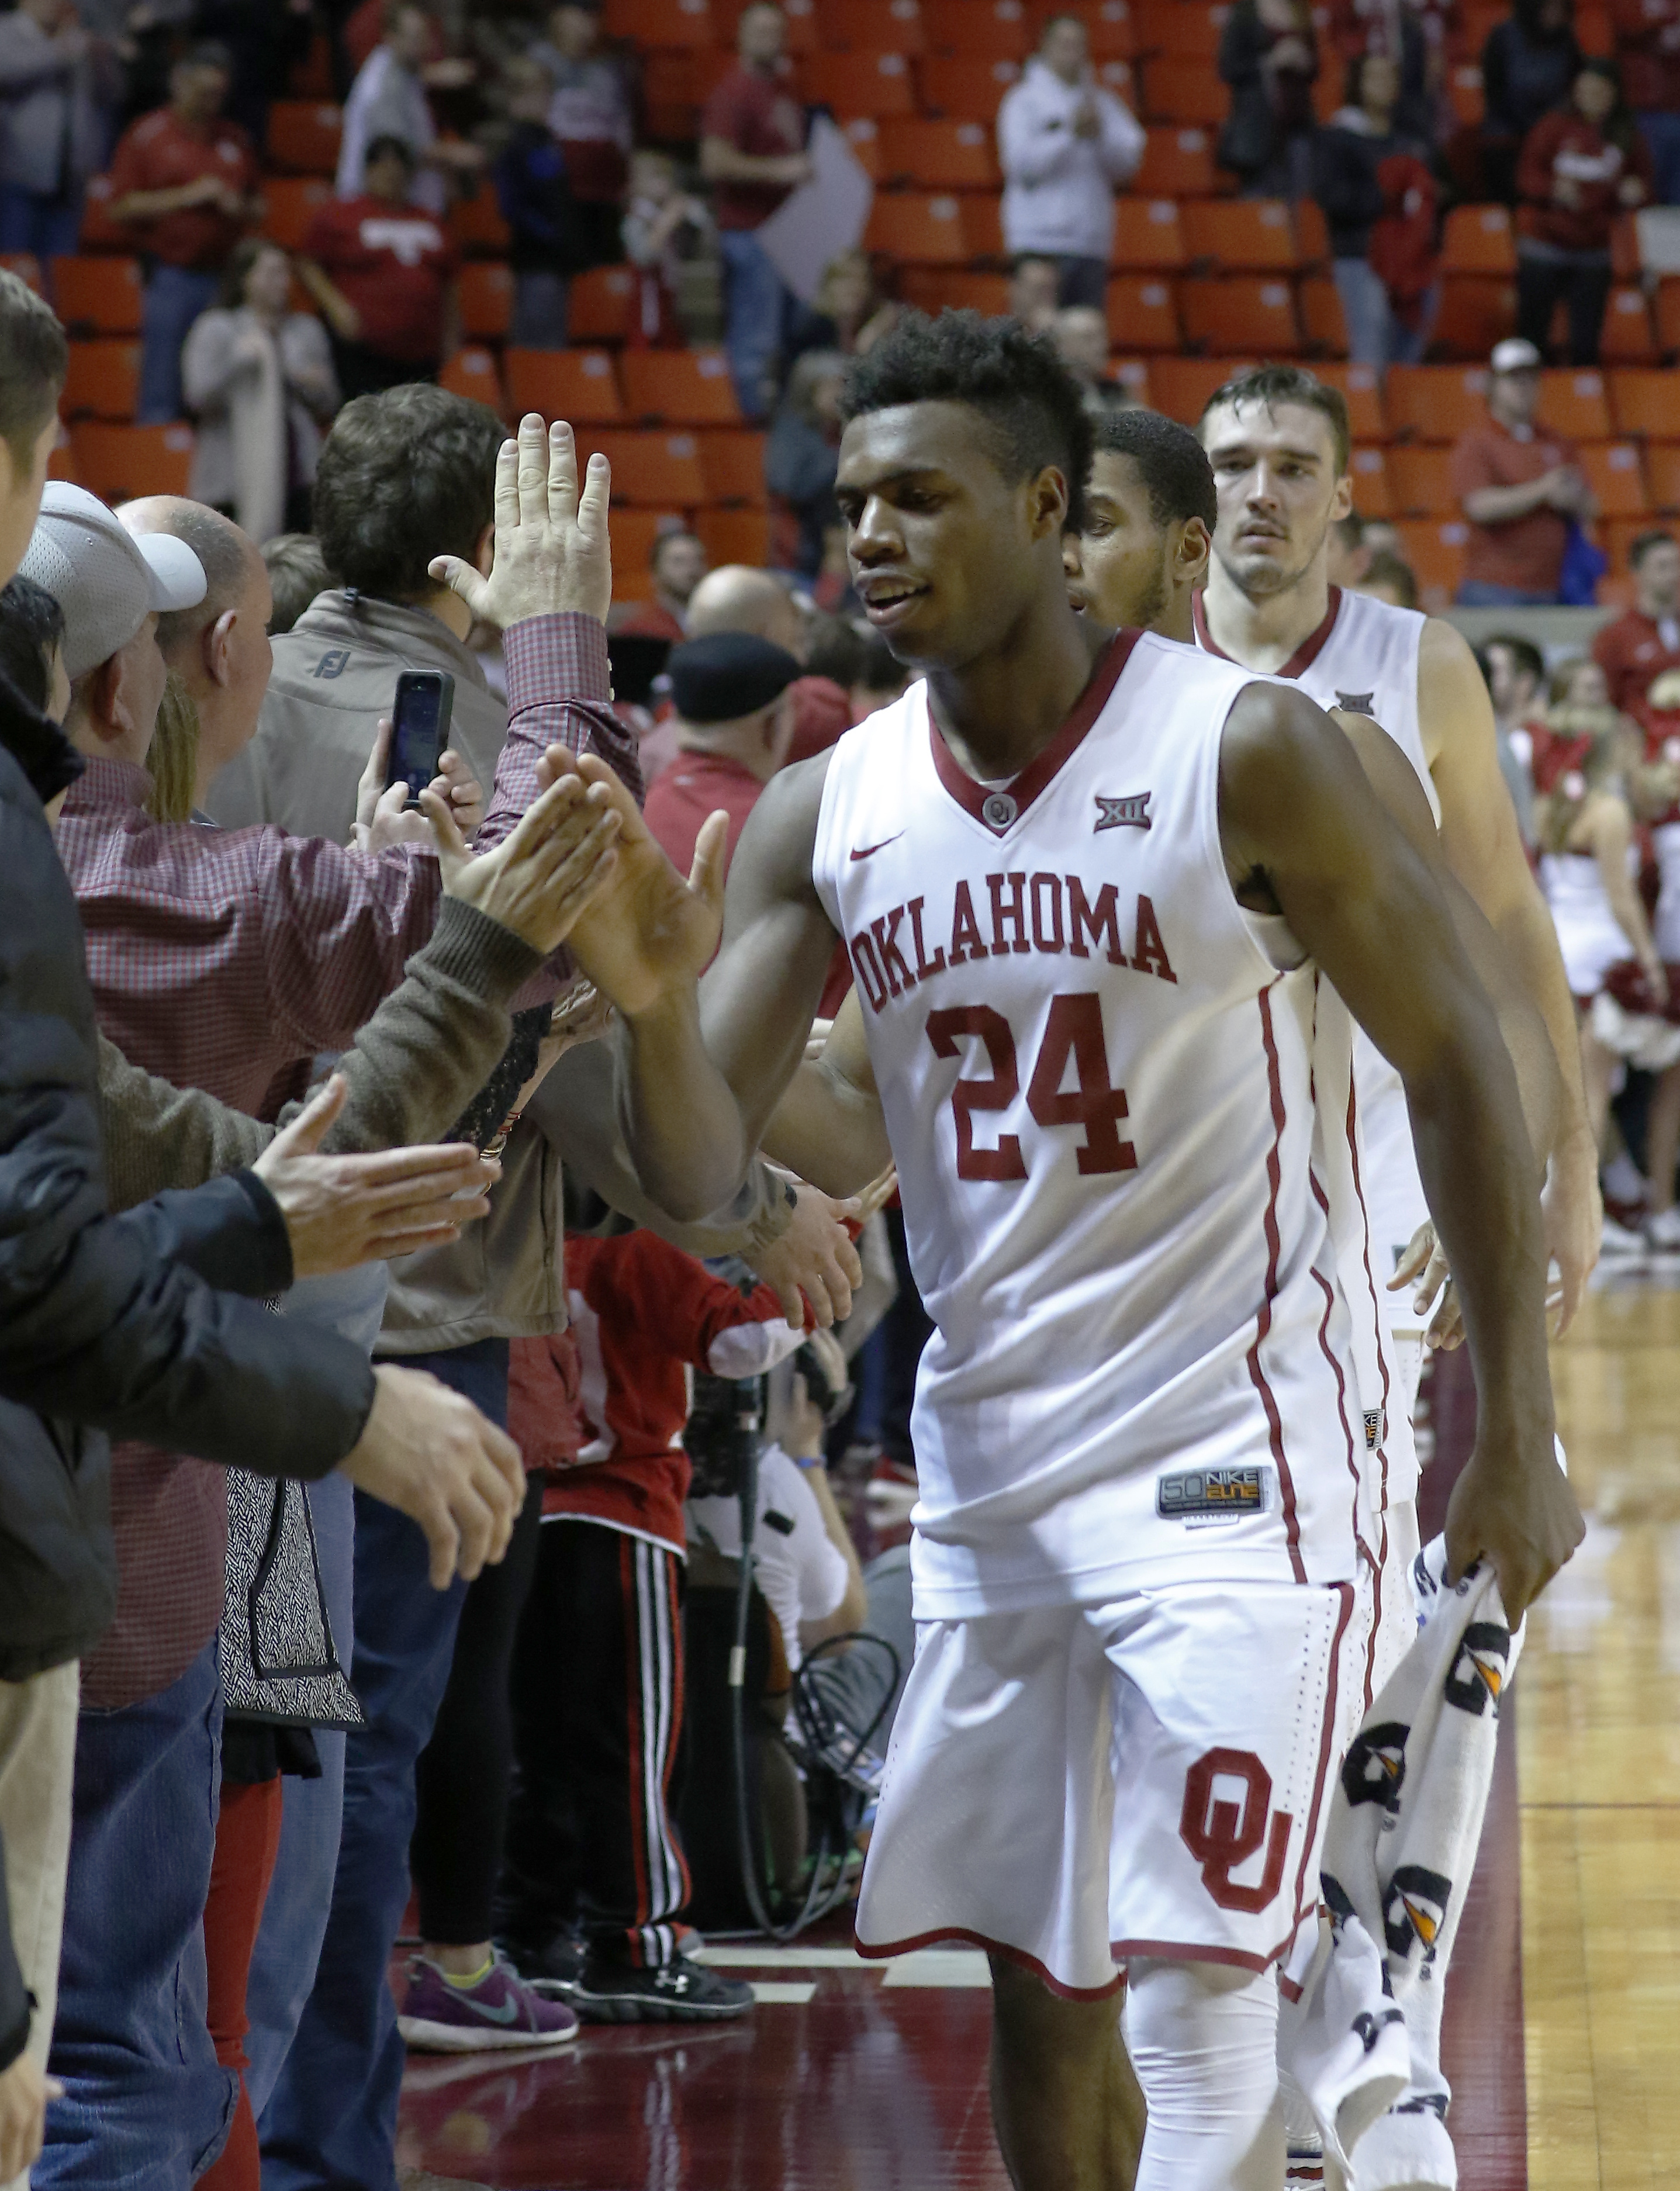 Oklahoma guard Buddy Hield (24) high fives fans after Oklahoma defeated TCU during an NCAA college basketball game in Norman, Okla., Tuesday, Feb. 2, 2016. Oklahoma won 95-72. (AP Photo/Alonzo Adams)